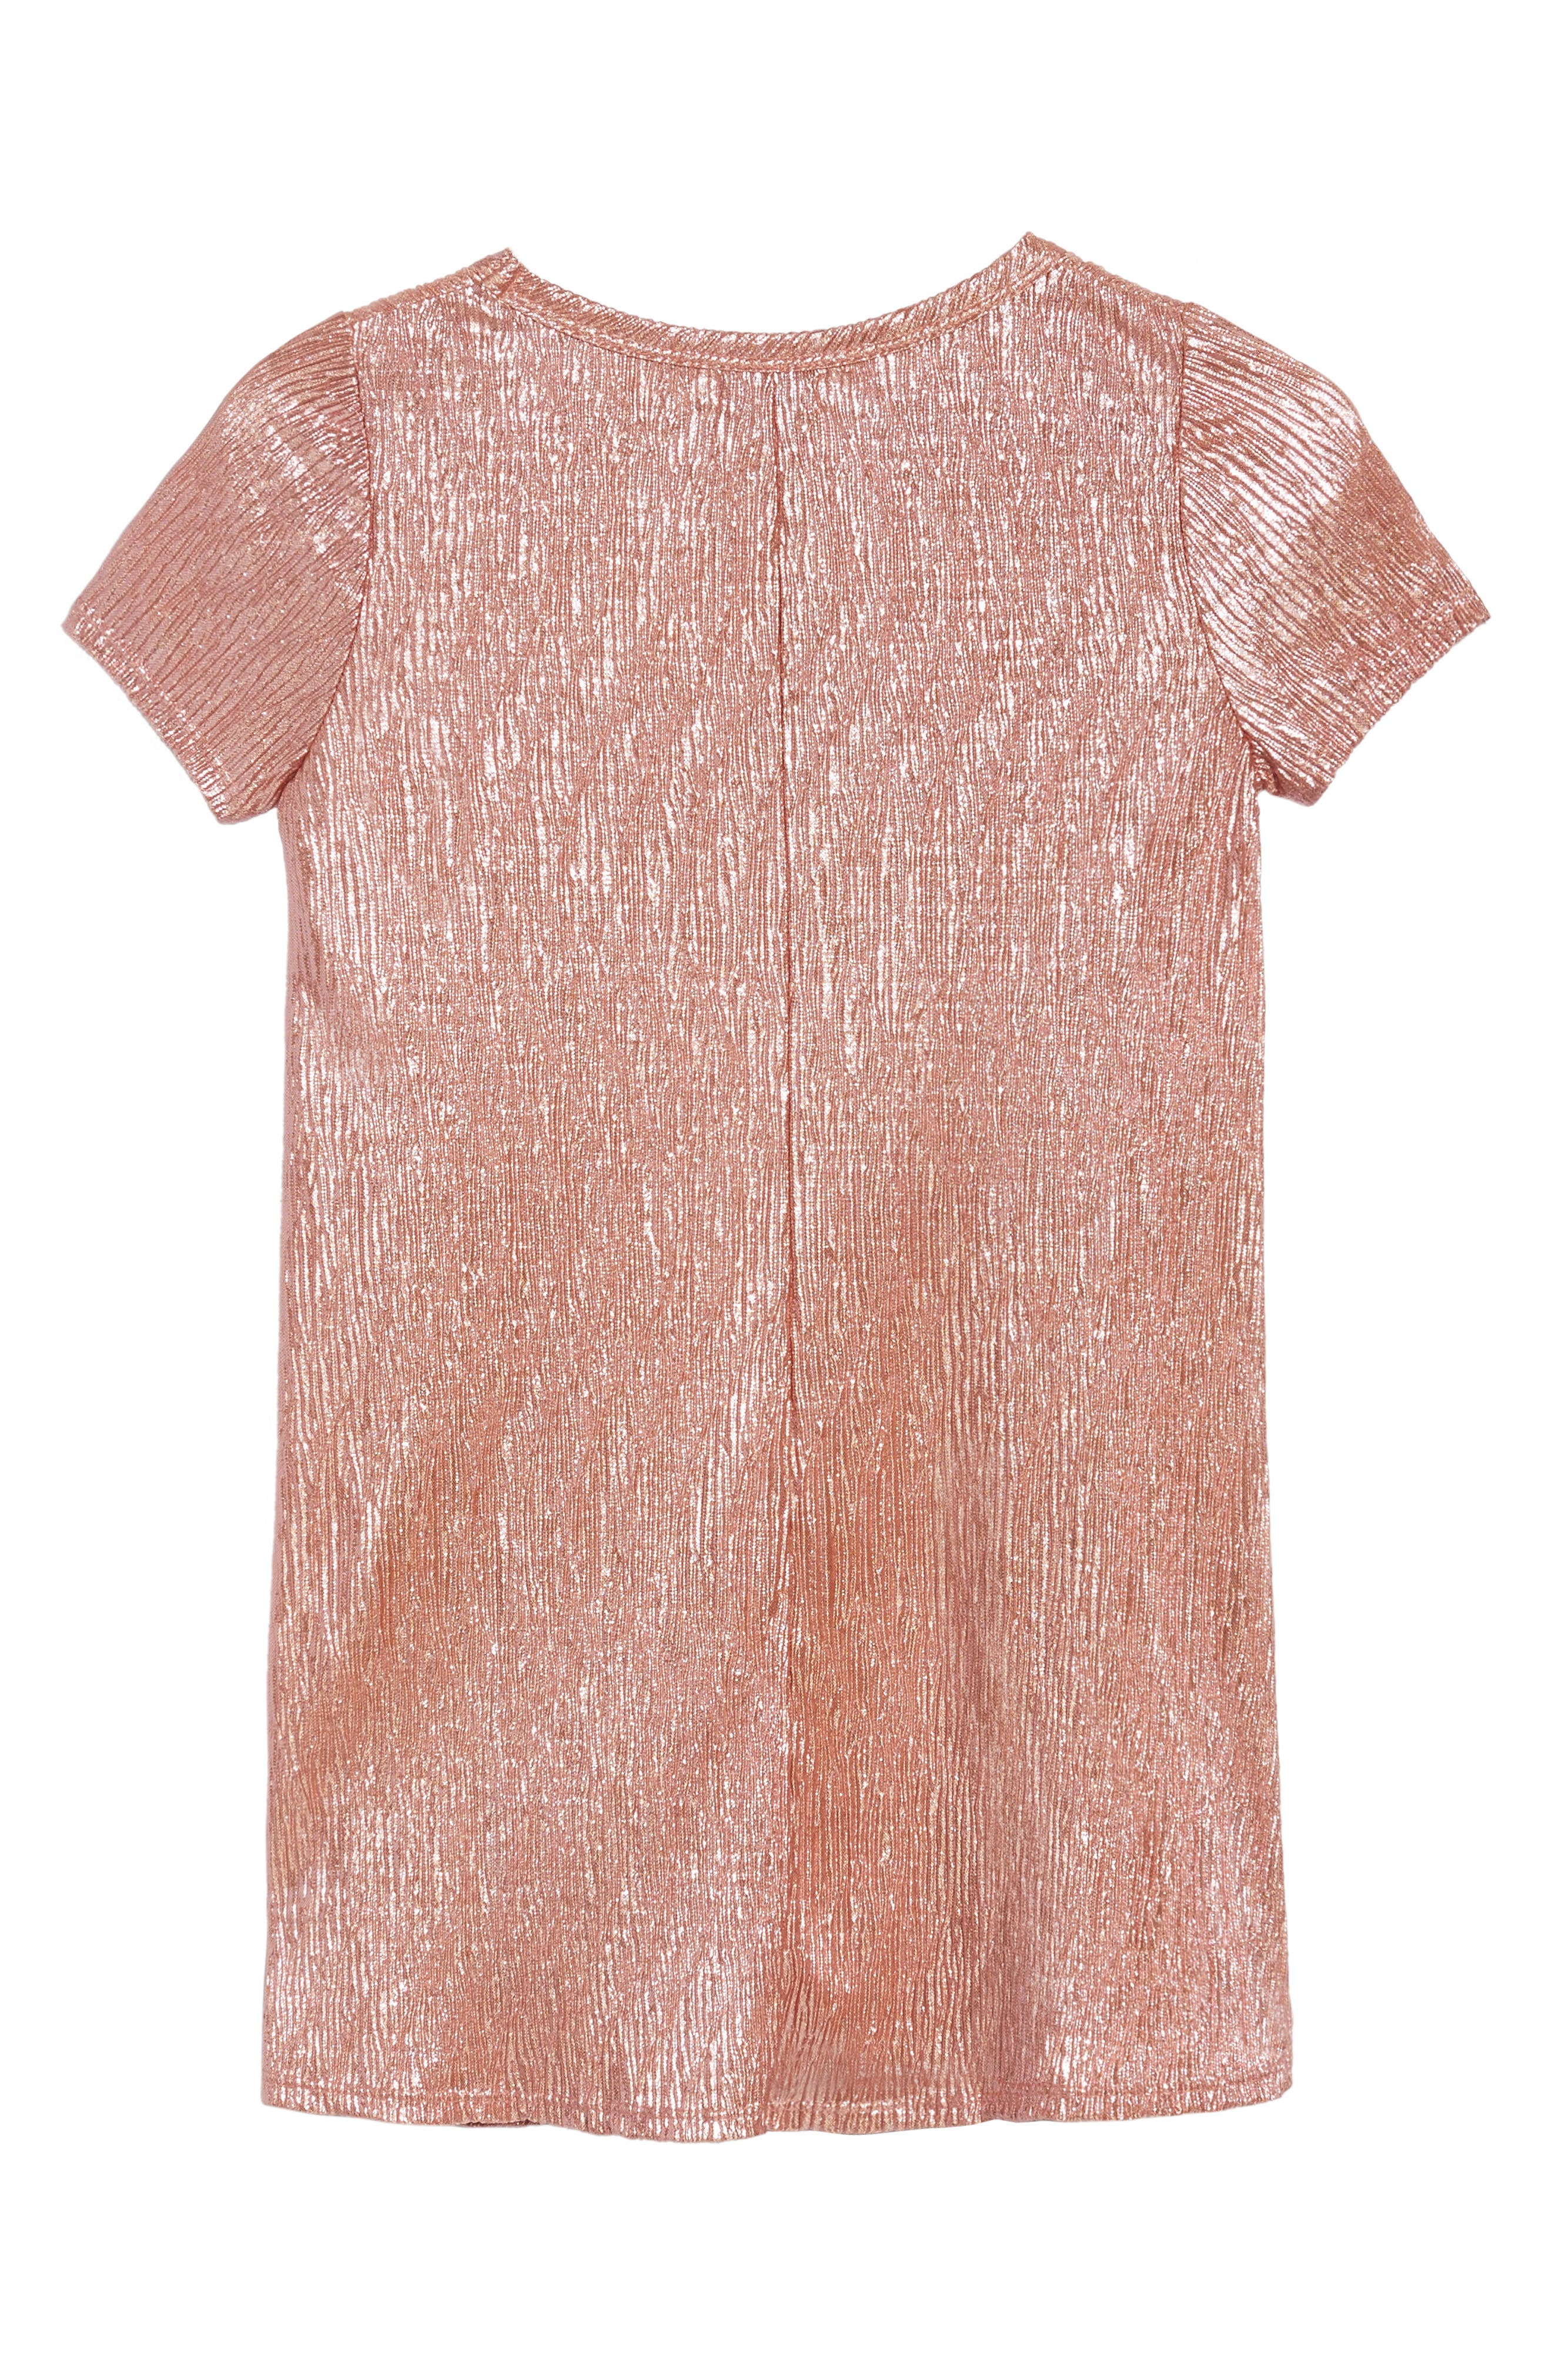 Love Fire Crinkled Metallic T-Shirt Dress,                             Alternate thumbnail 3, color,                             Pink